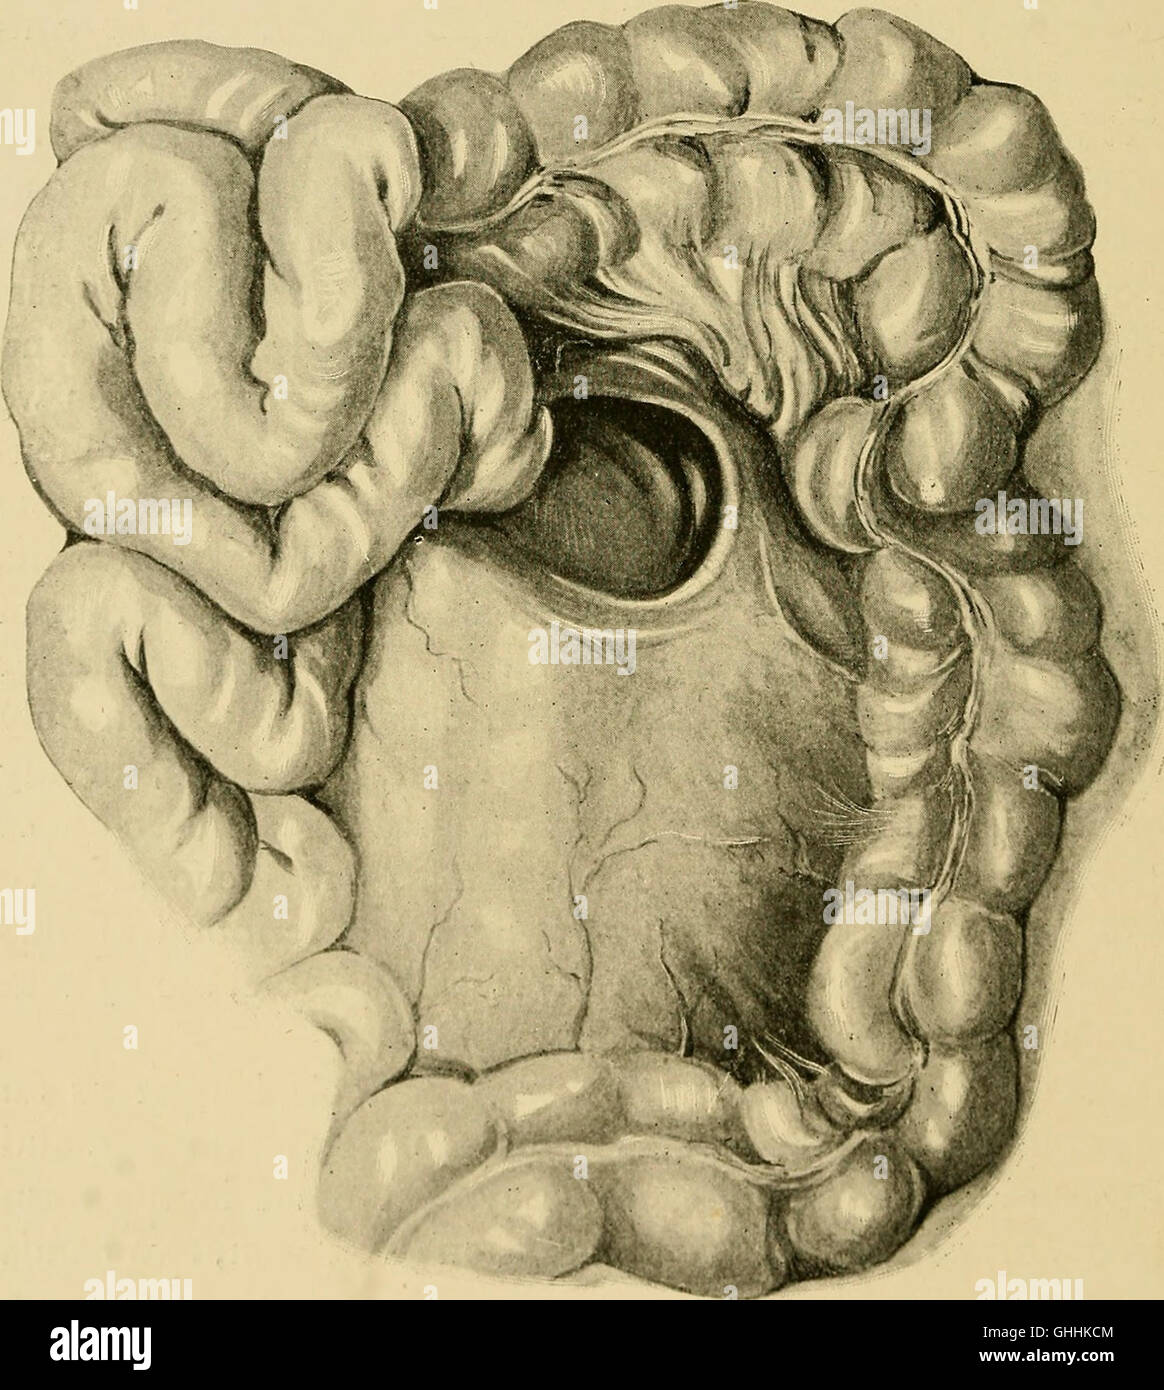 Retro-peritonealen Leistenbruch - Seins \